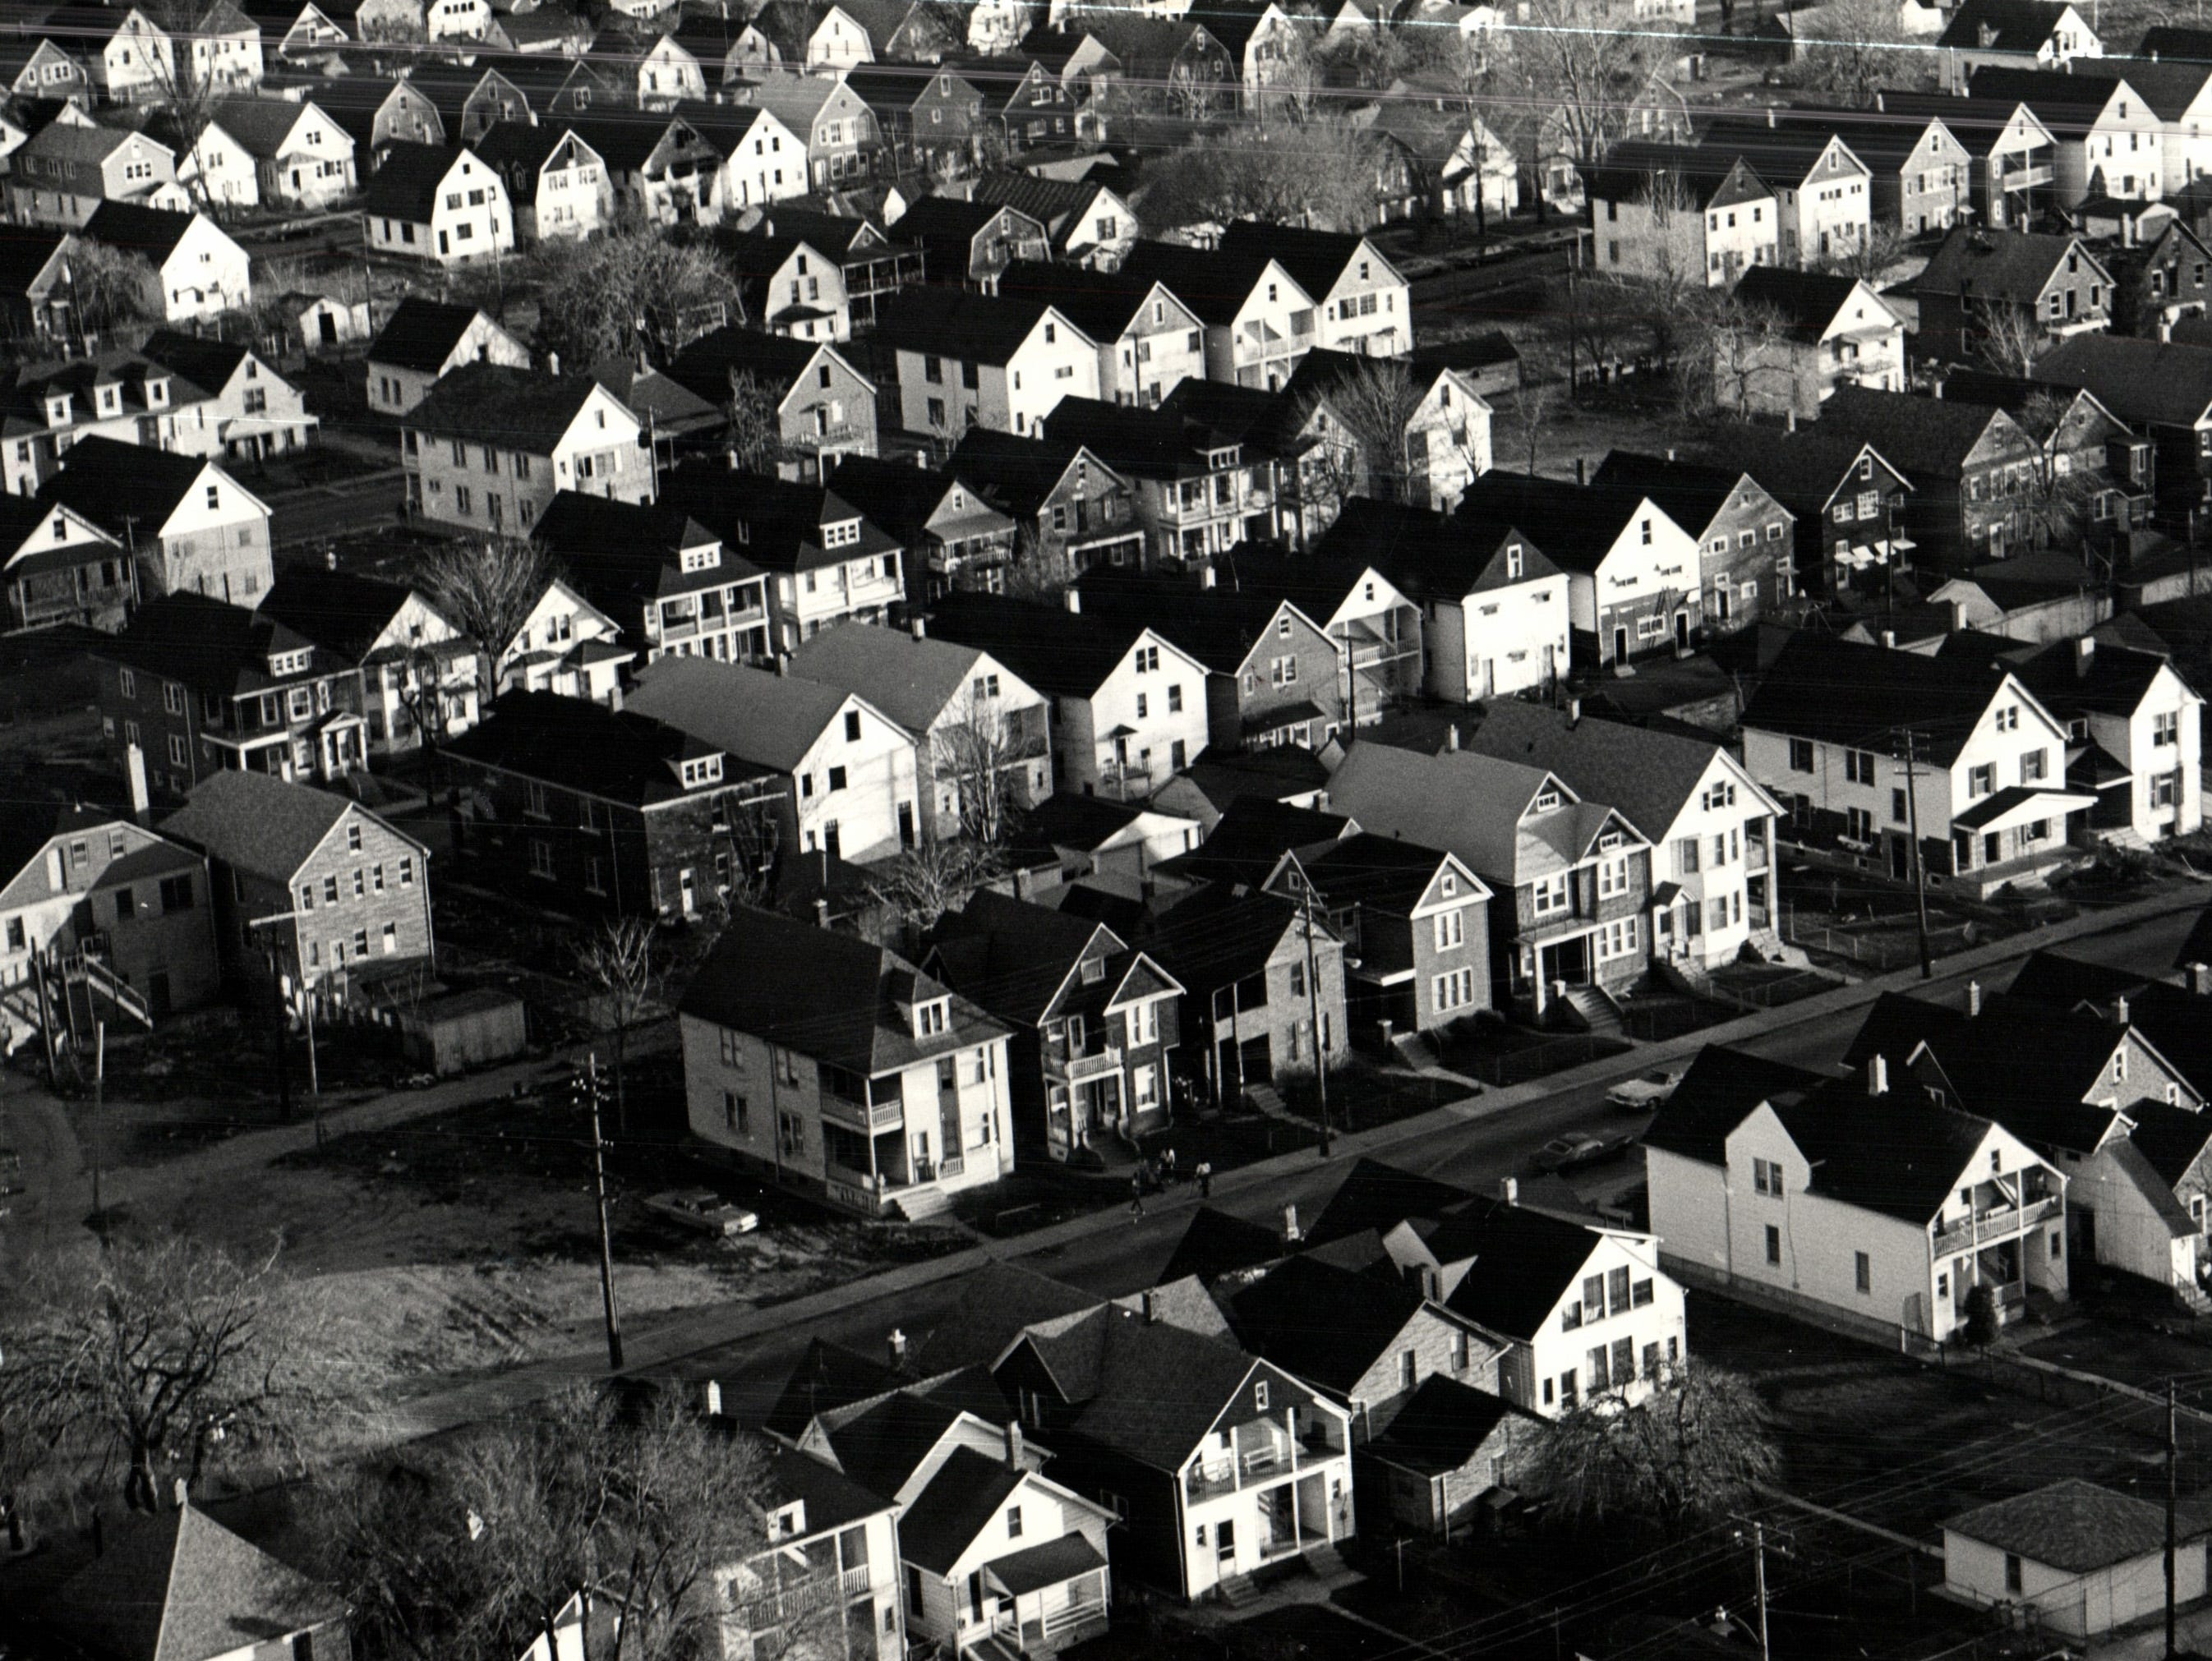 Poletown East neighborhood in Detroit, Michigan.